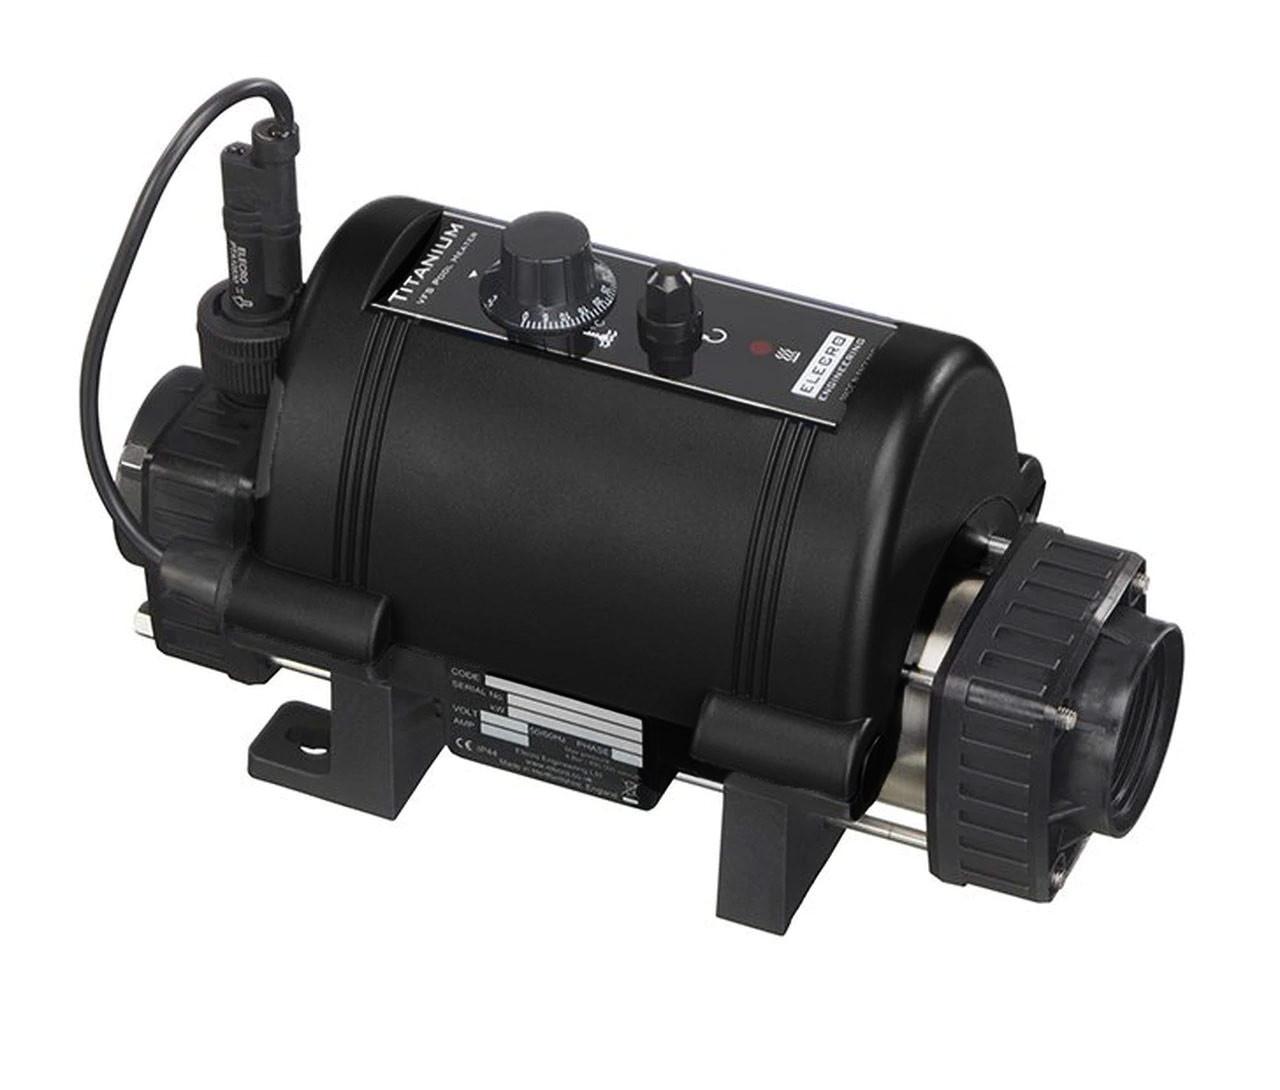 Elecro Nano black pool heater 3kw